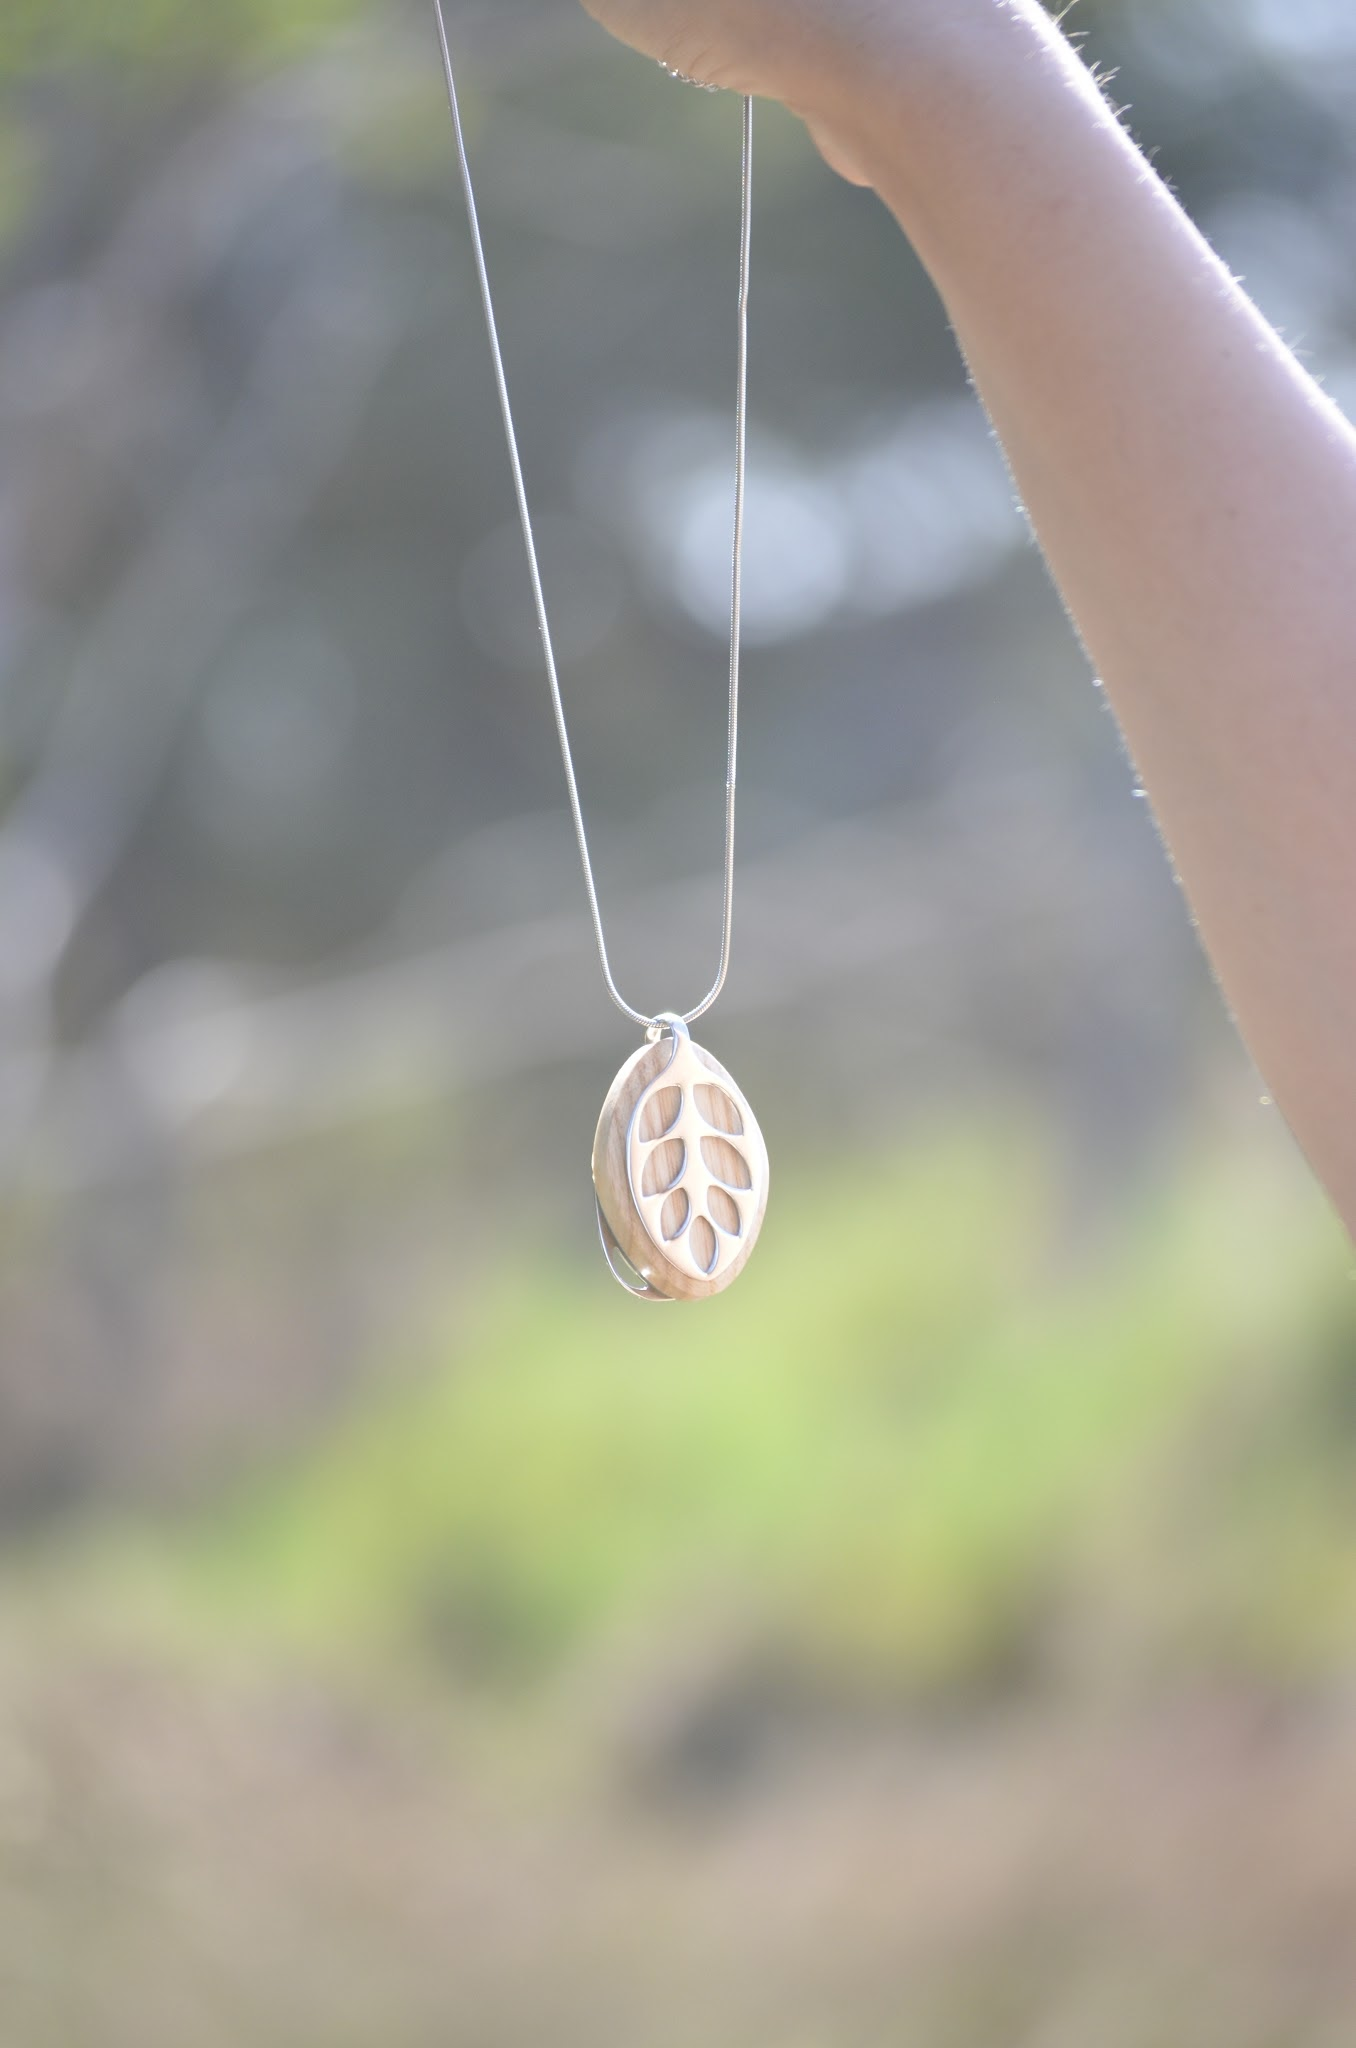 smart_jewelry_health_traker_leaf